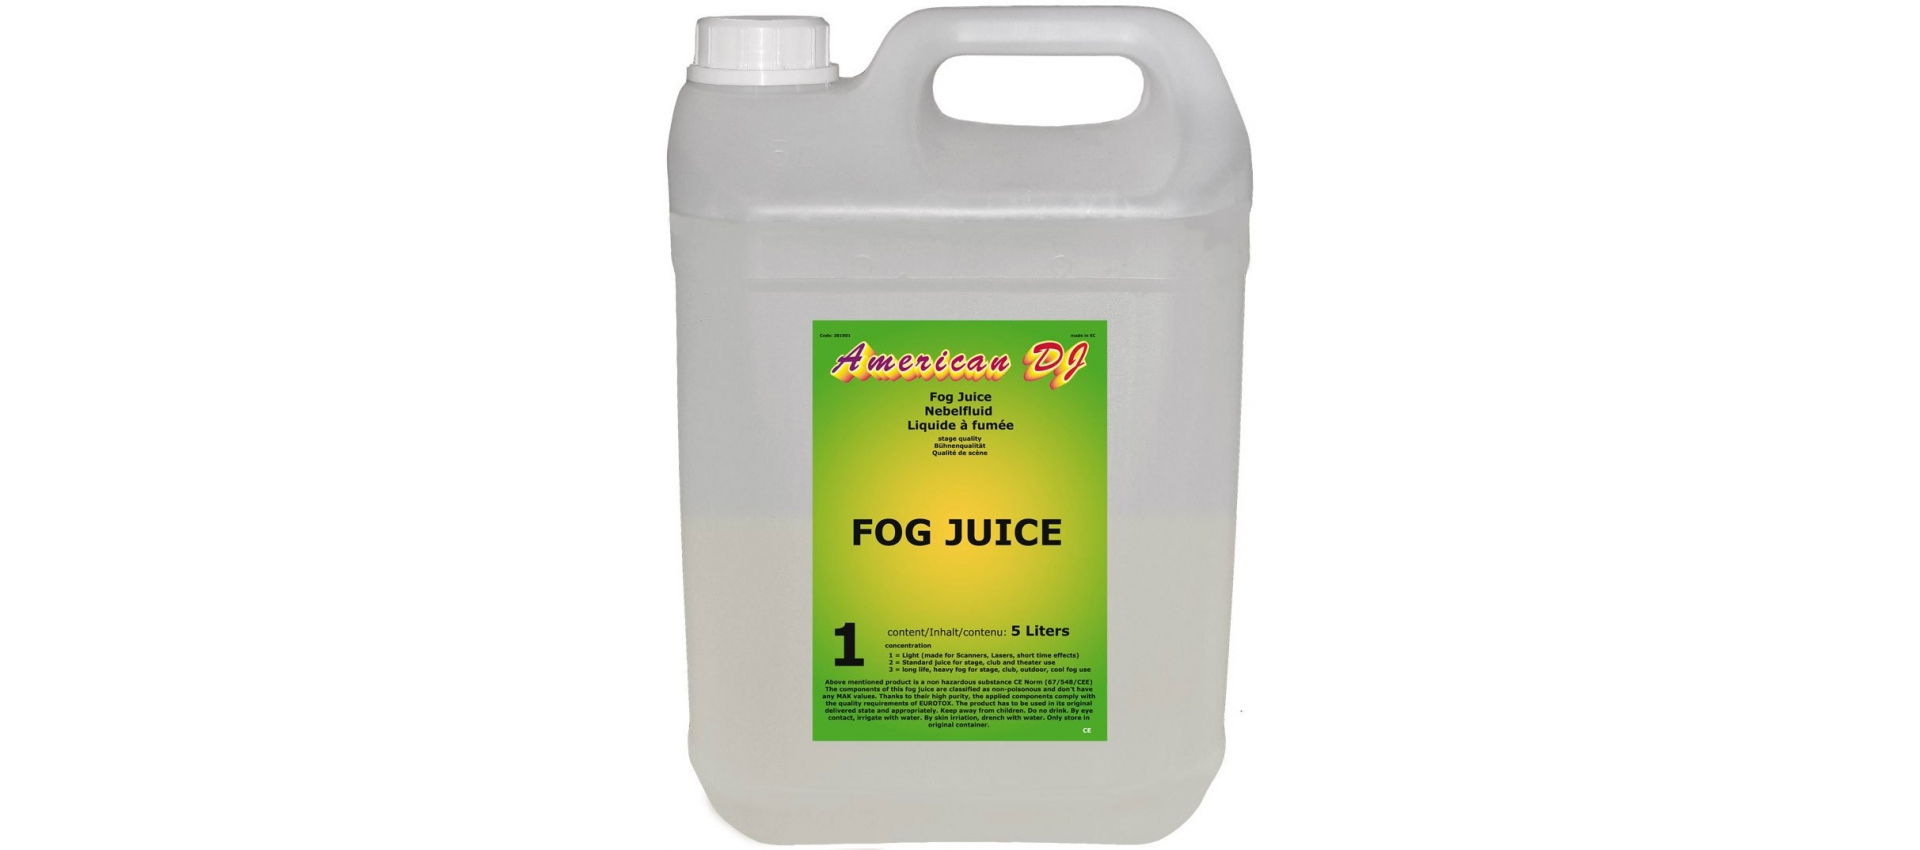 fog machine juice